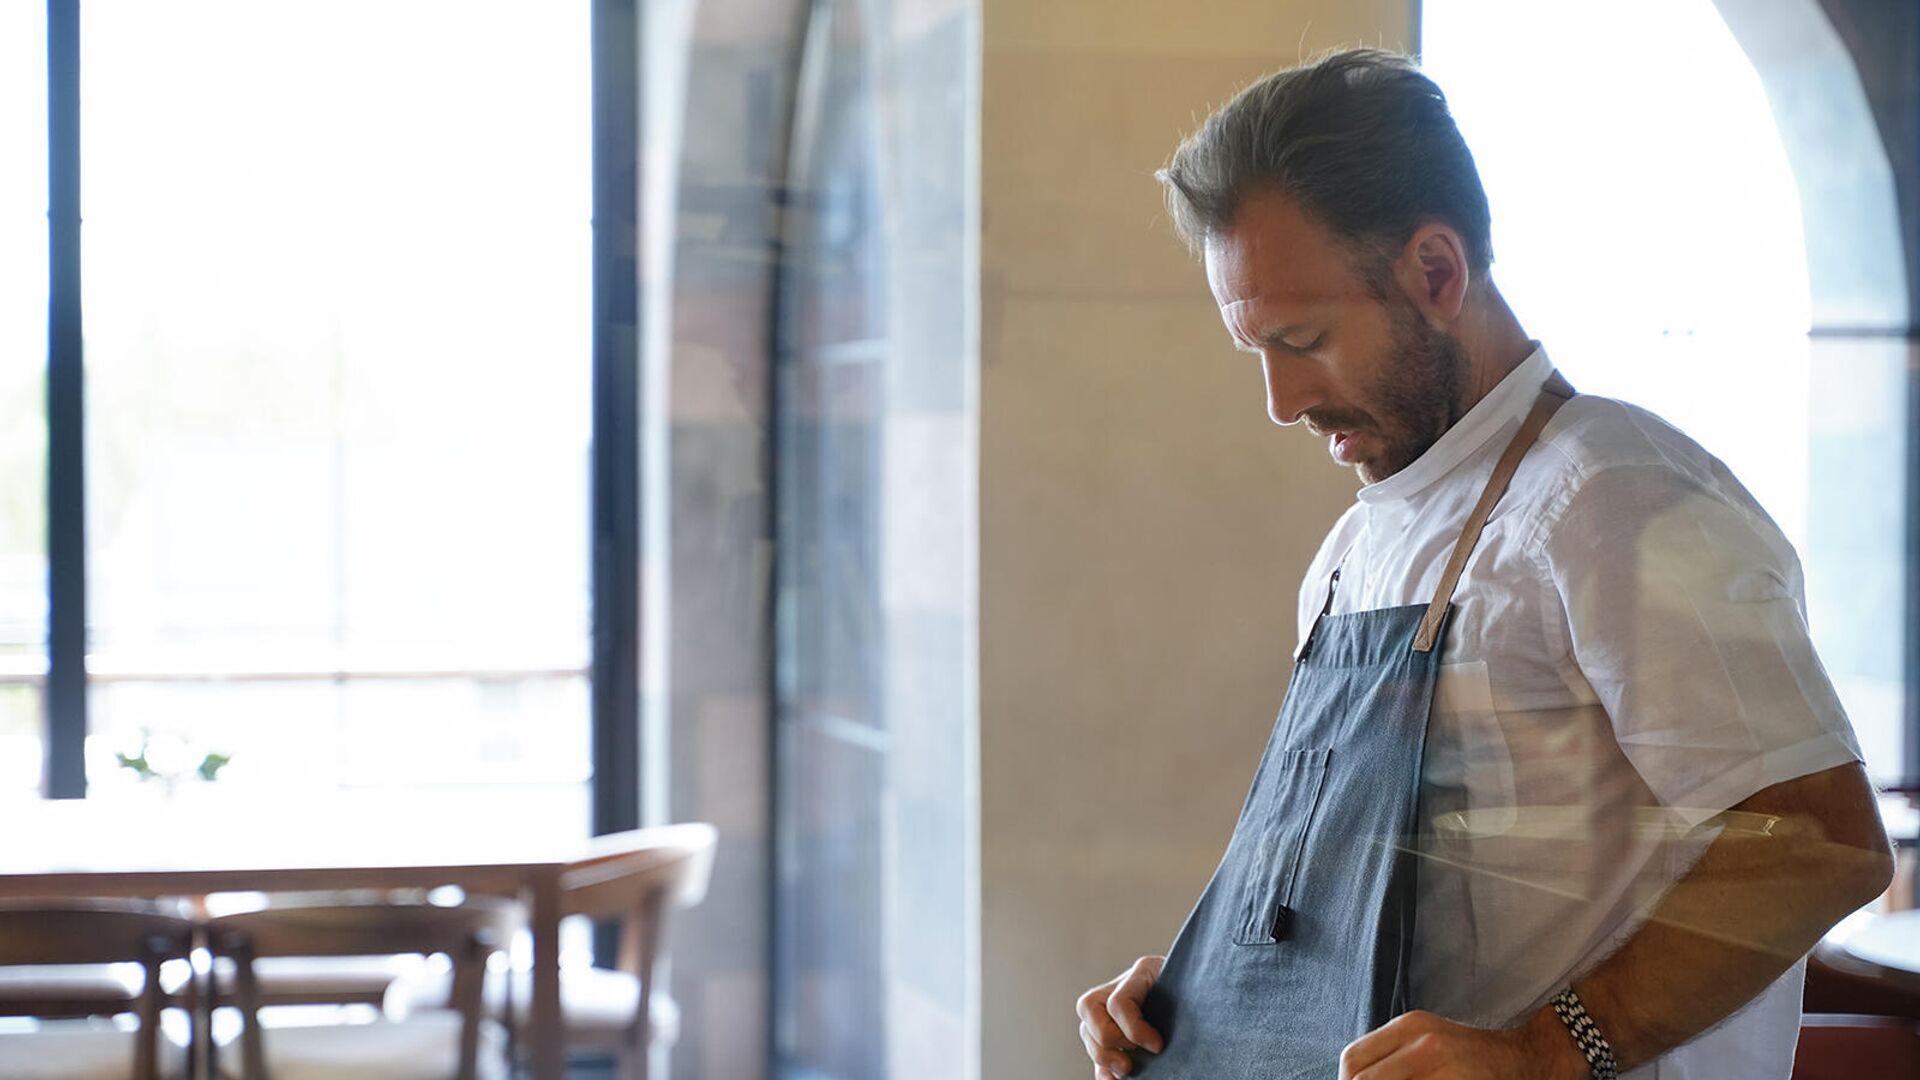 Шеф Мэдс Рефслунд на кухне ресторана Tsaghkunk Restaurant&Glkhatun - Sputnik Արմենիա, 1920, 25.09.2021